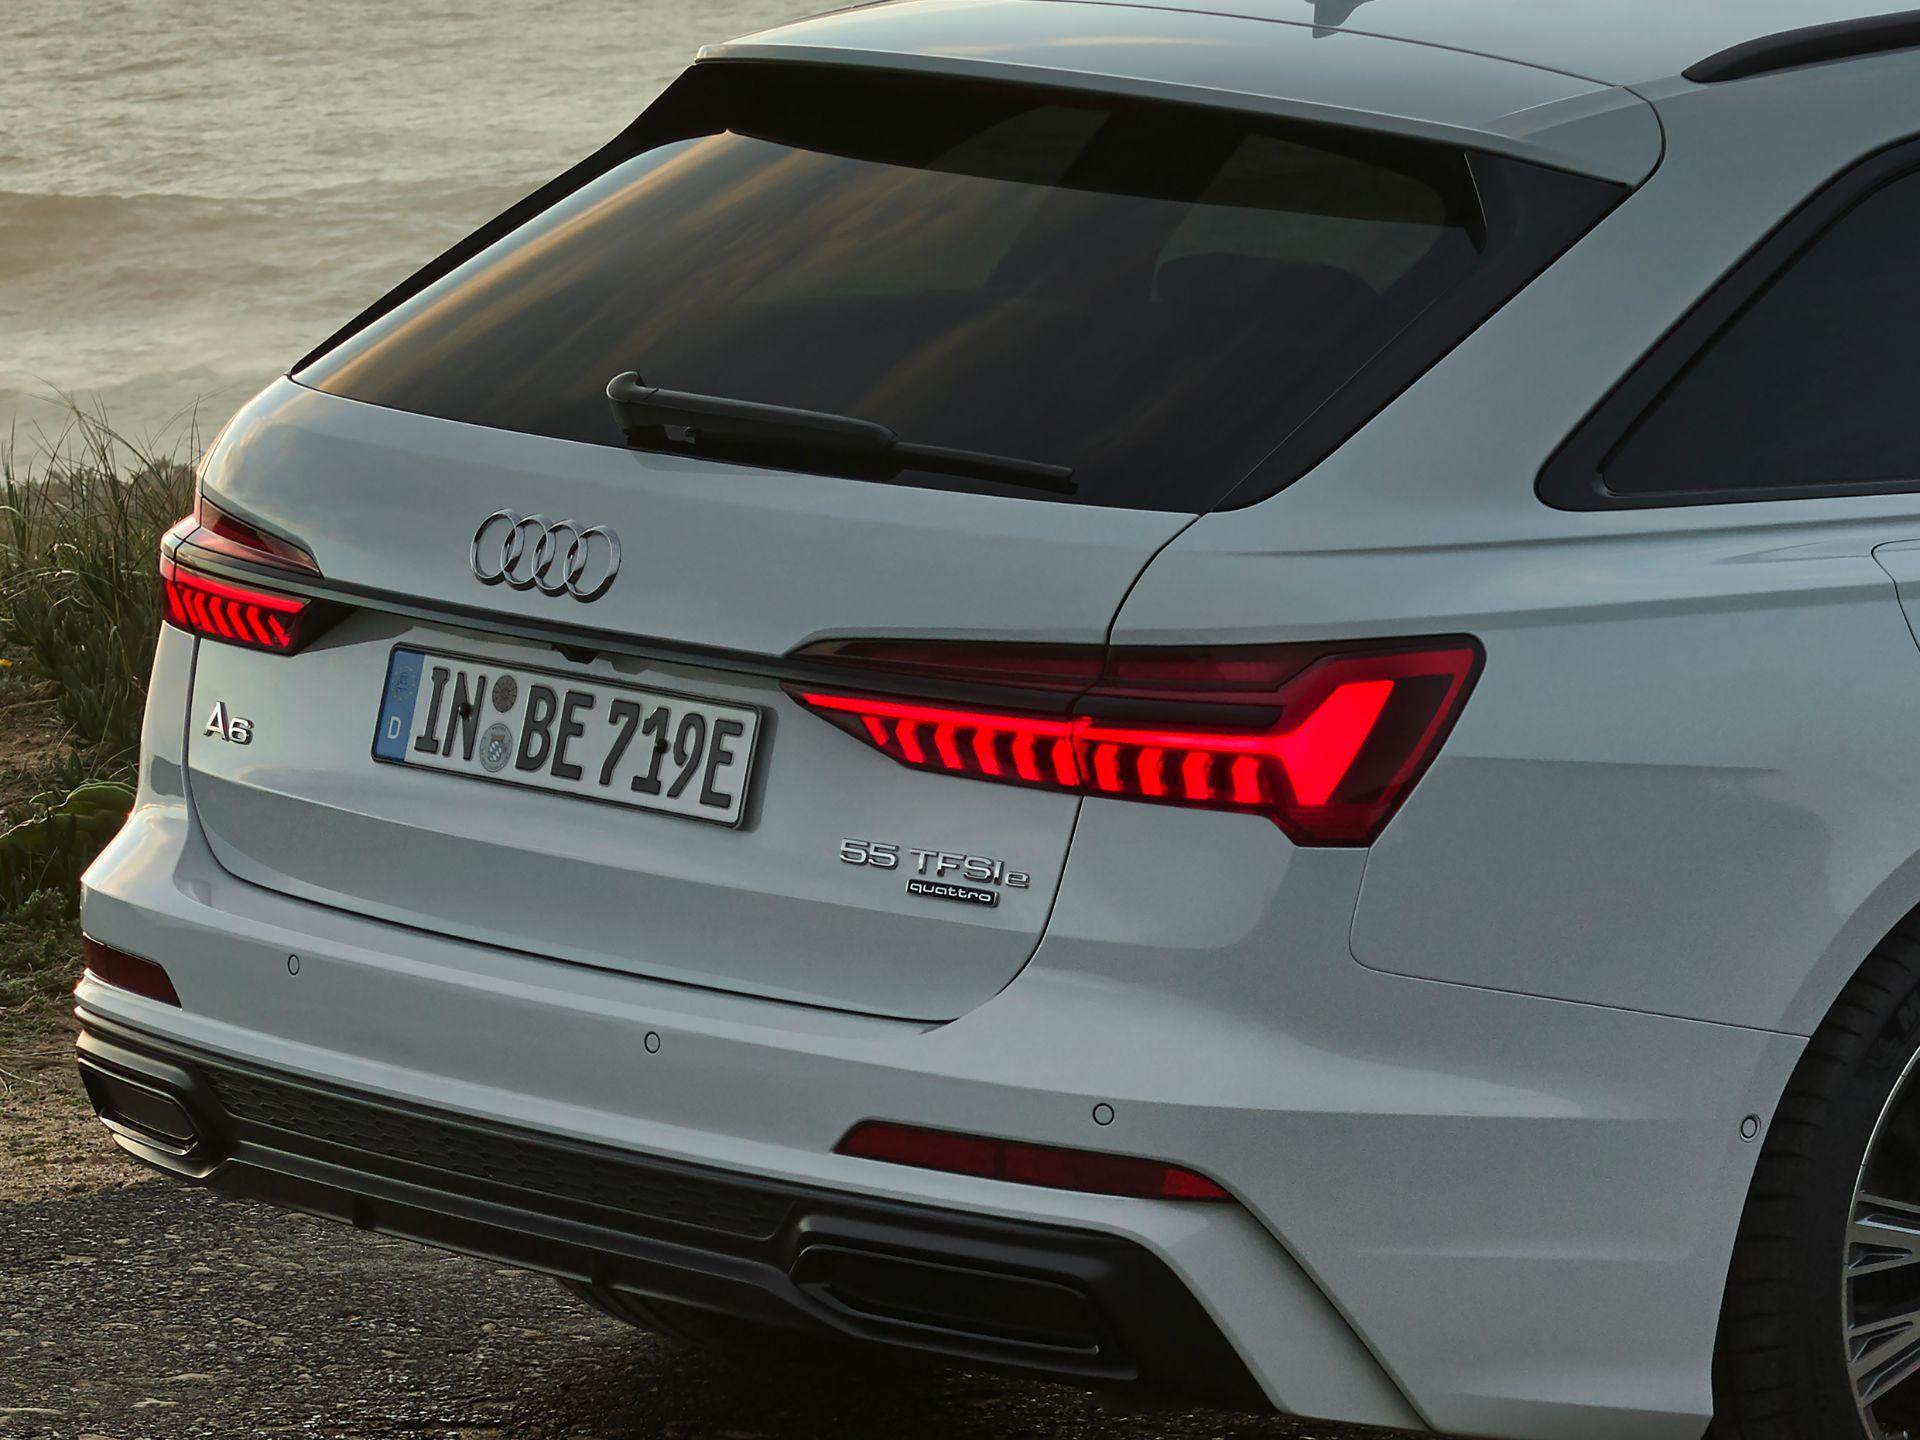 2021 Audi A6 Avant TFSI e quattro (Photos, price ...